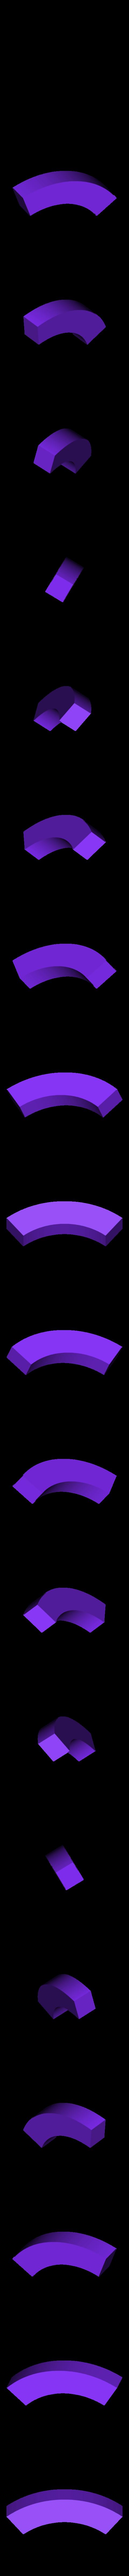 03.stl Download STL file Suport Headset Overwatch • 3D printer design, Geandro_Valcorte